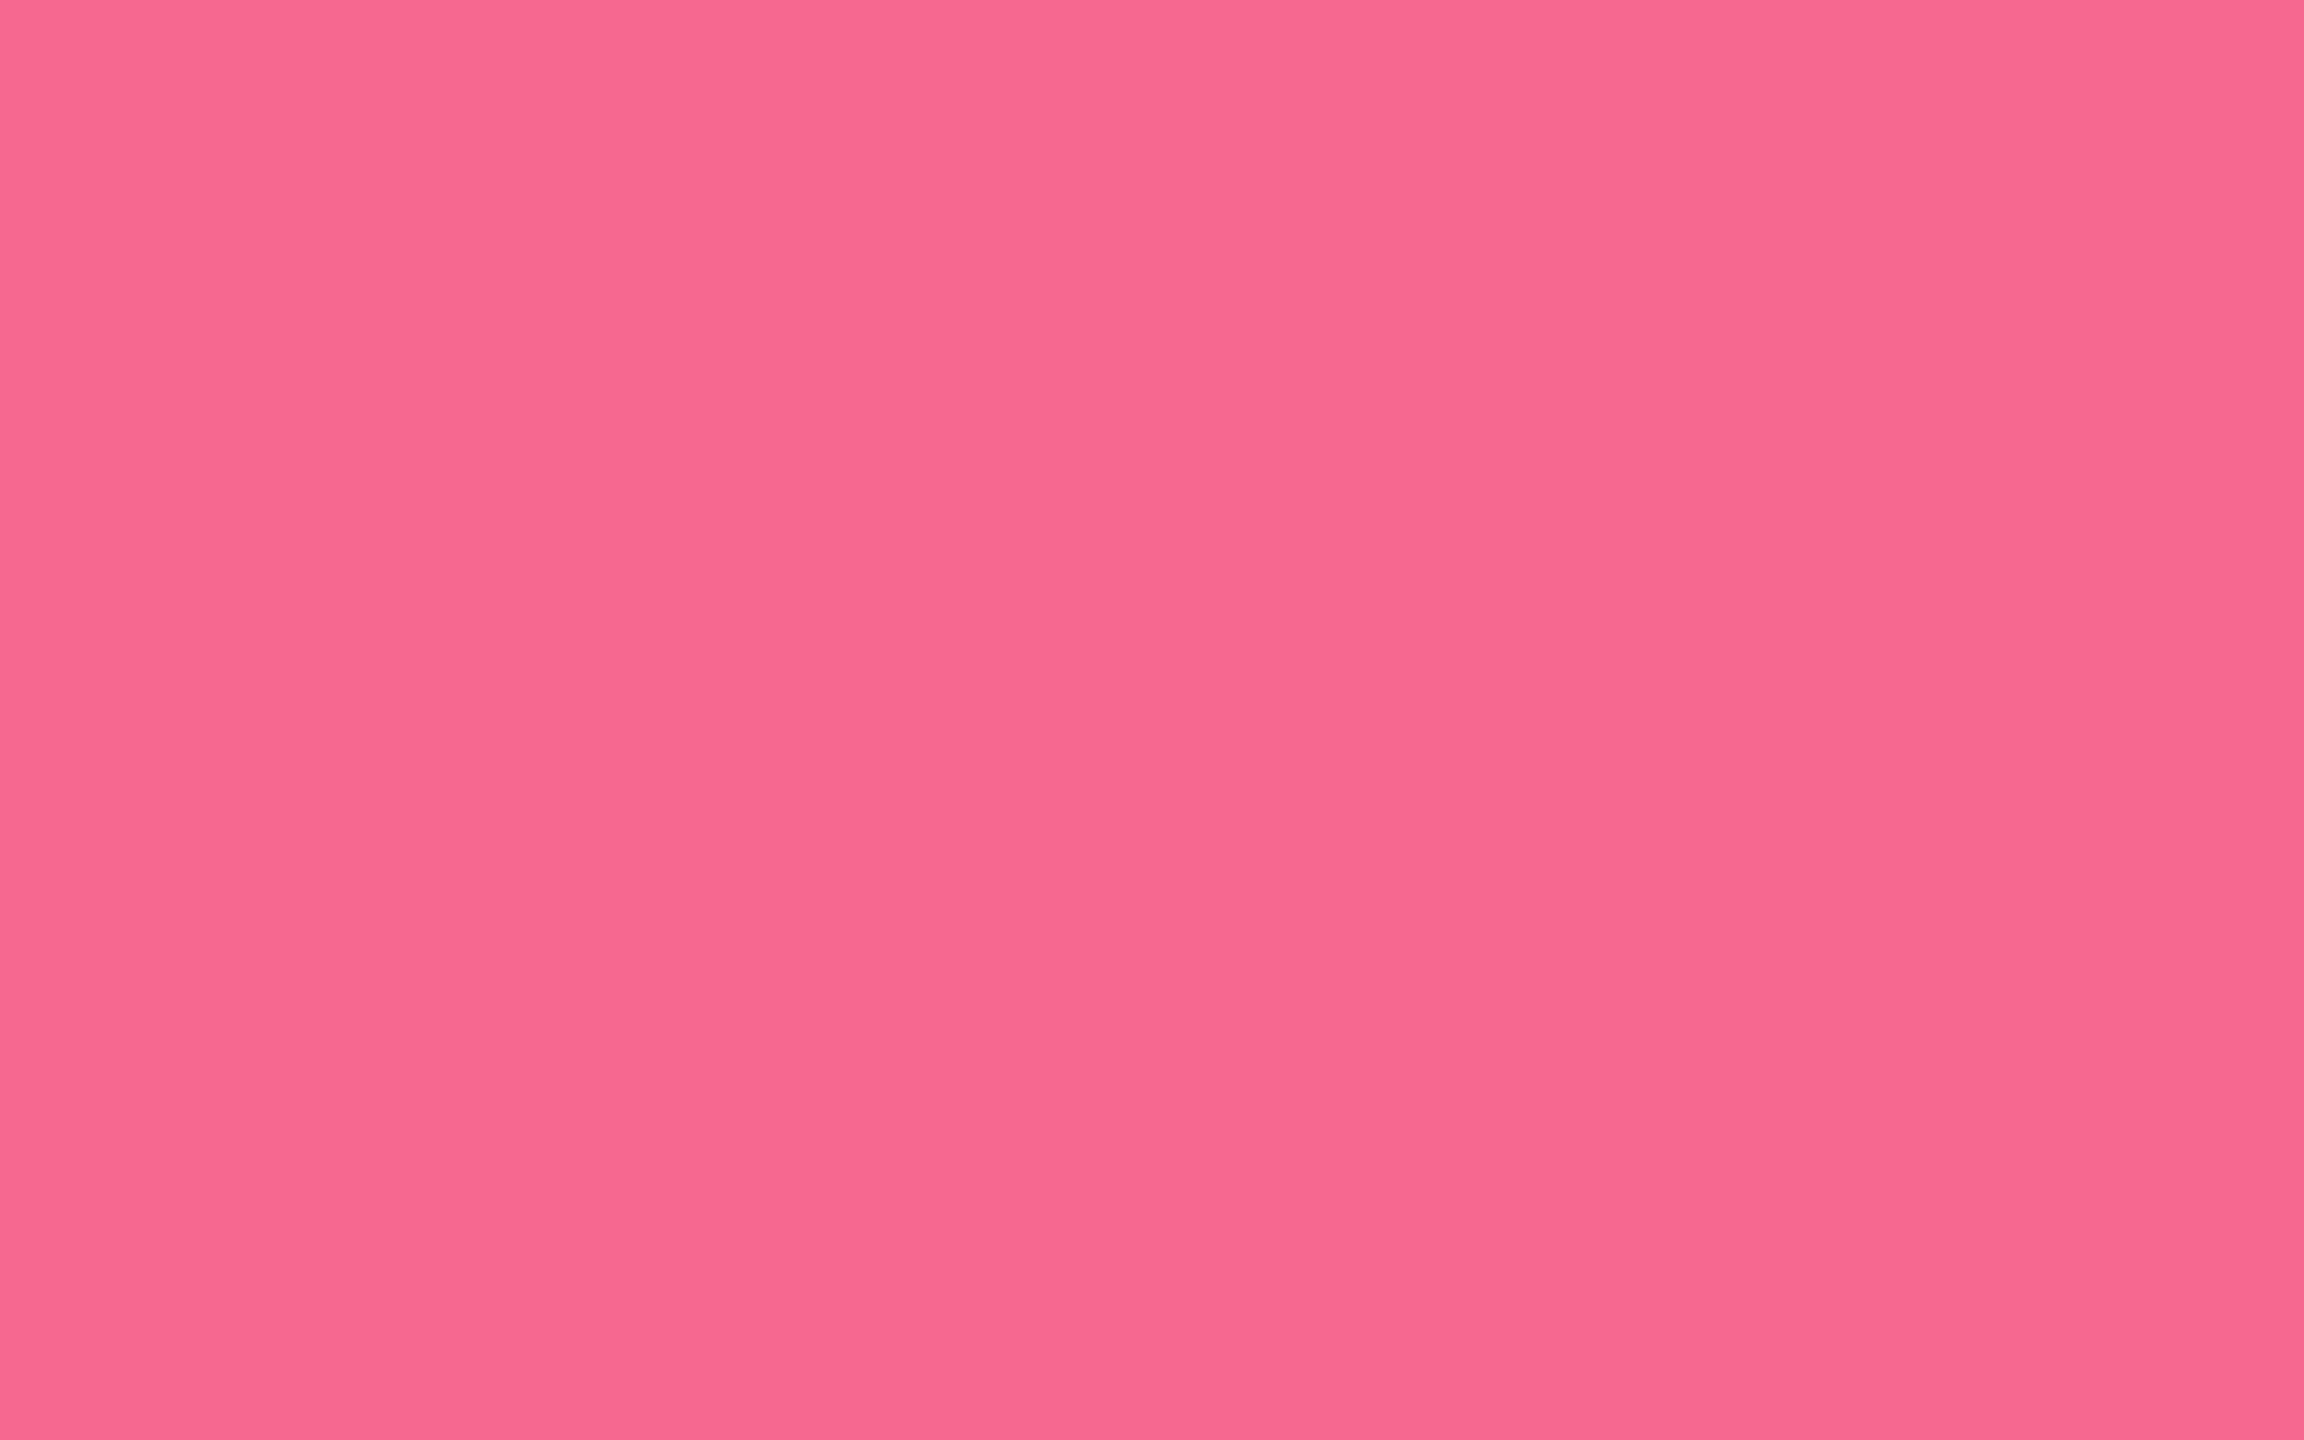 2304x1440 Light Crimson Solid Color Background